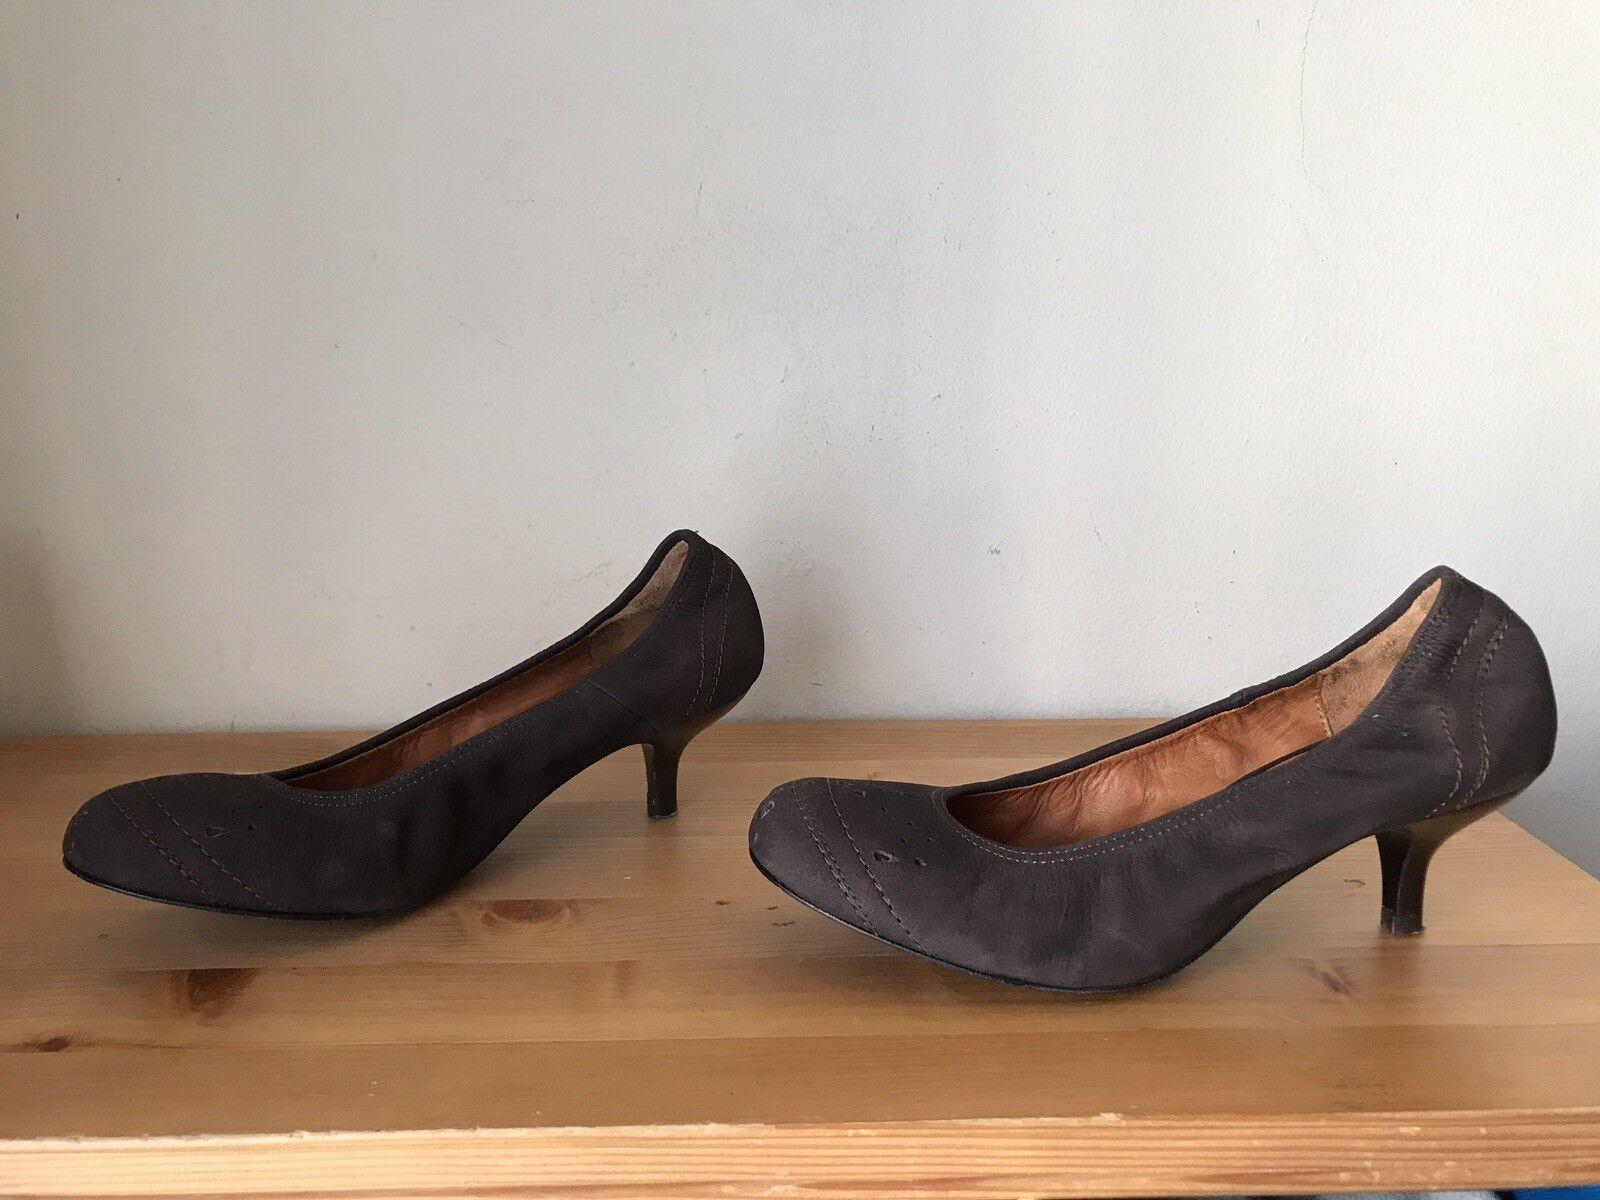 Lanvin Marrón Marrón Marrón Cuero Láser Zapatos De Salón Tacón Gatito Talla 40 US 8.5  envío gratuito a nivel mundial